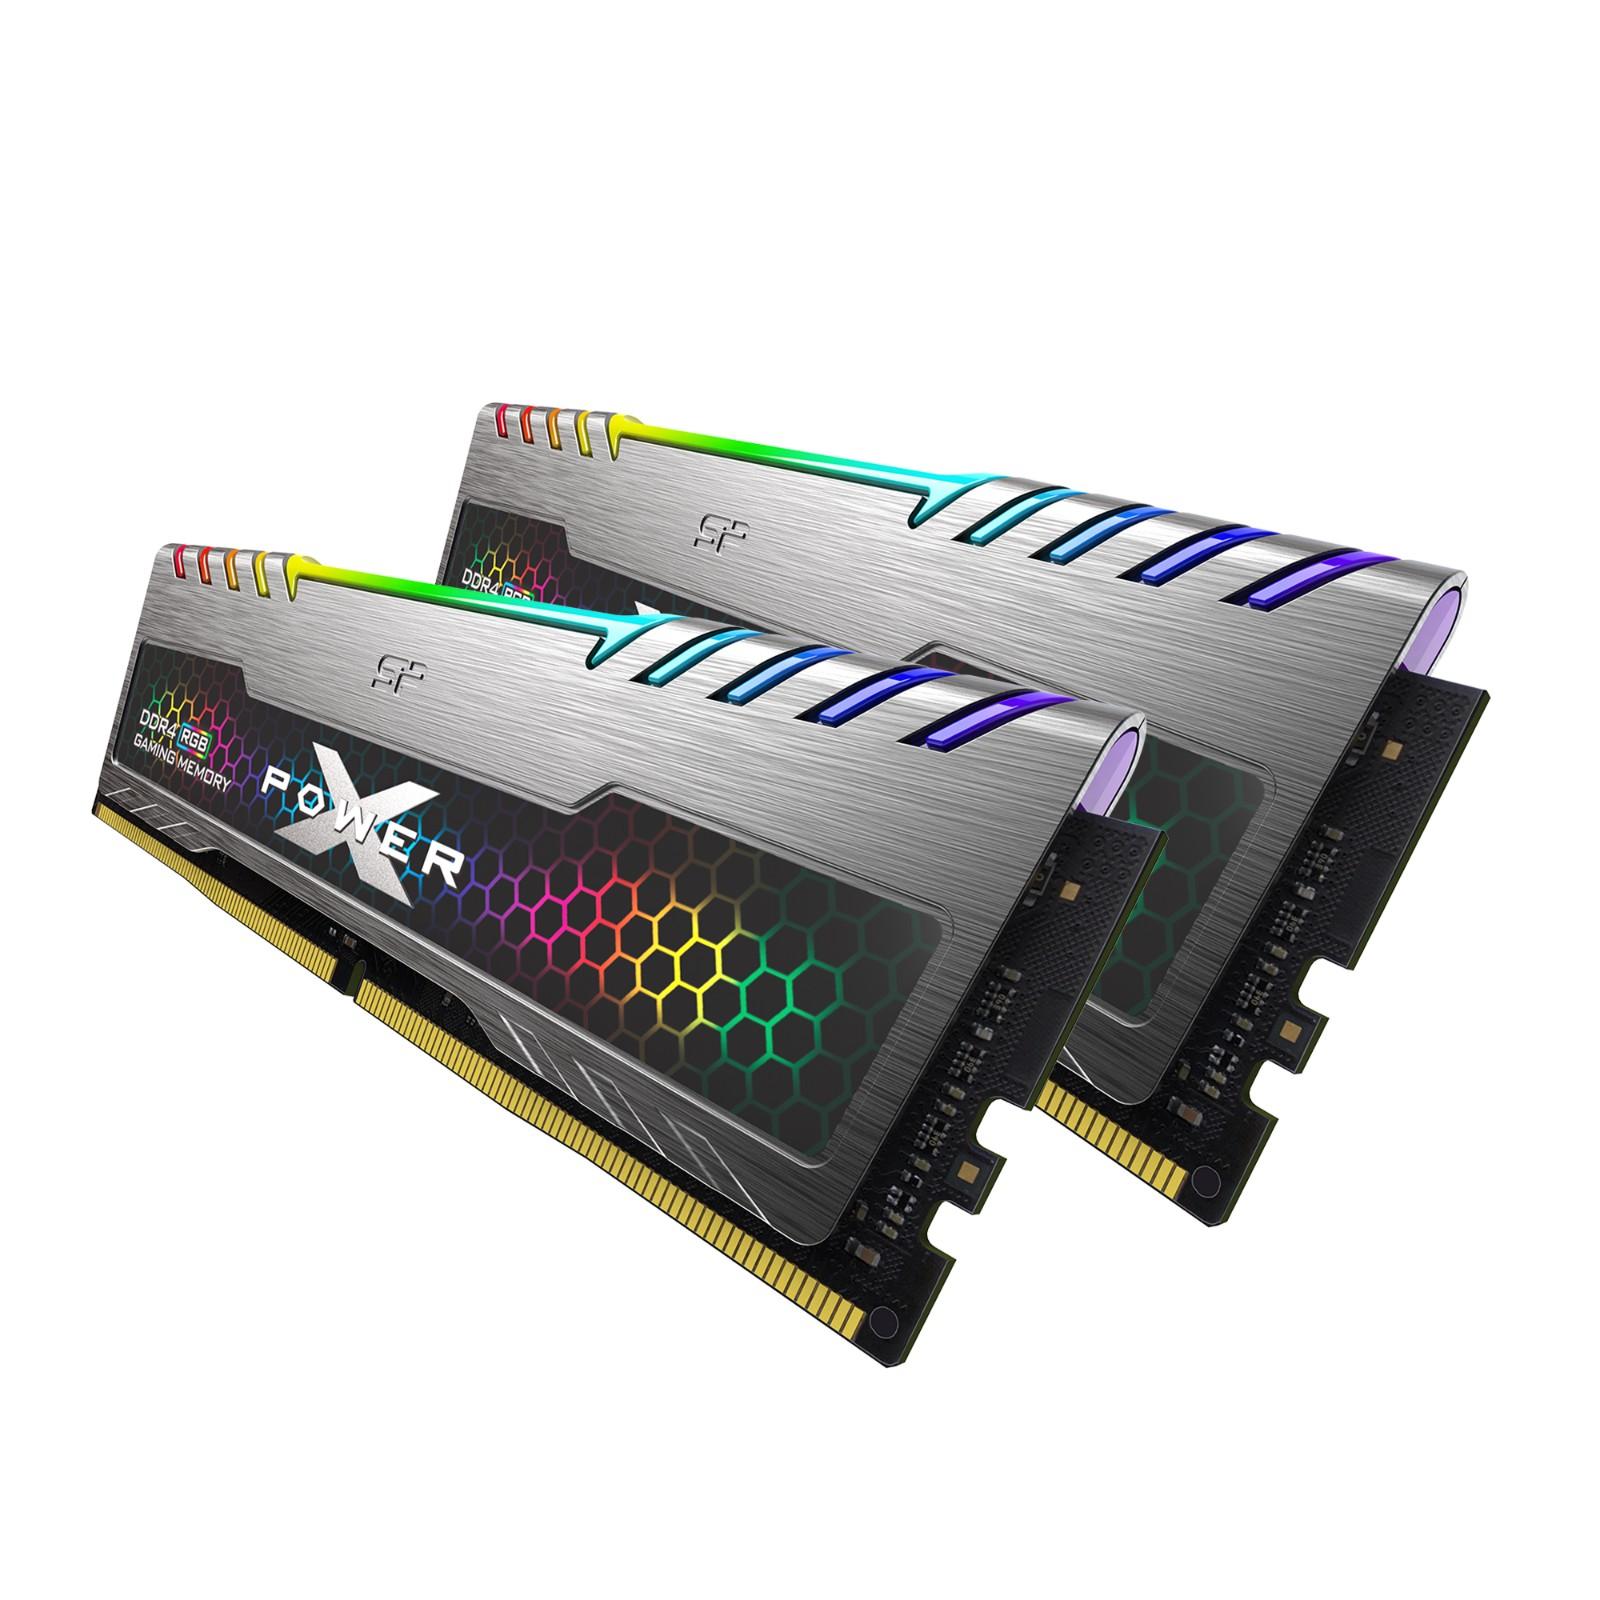 Silicon Power 32GB (2x16GB) RGB DDR4 3200MHz CL16 Turbine Gaming Desktop Memory RAM